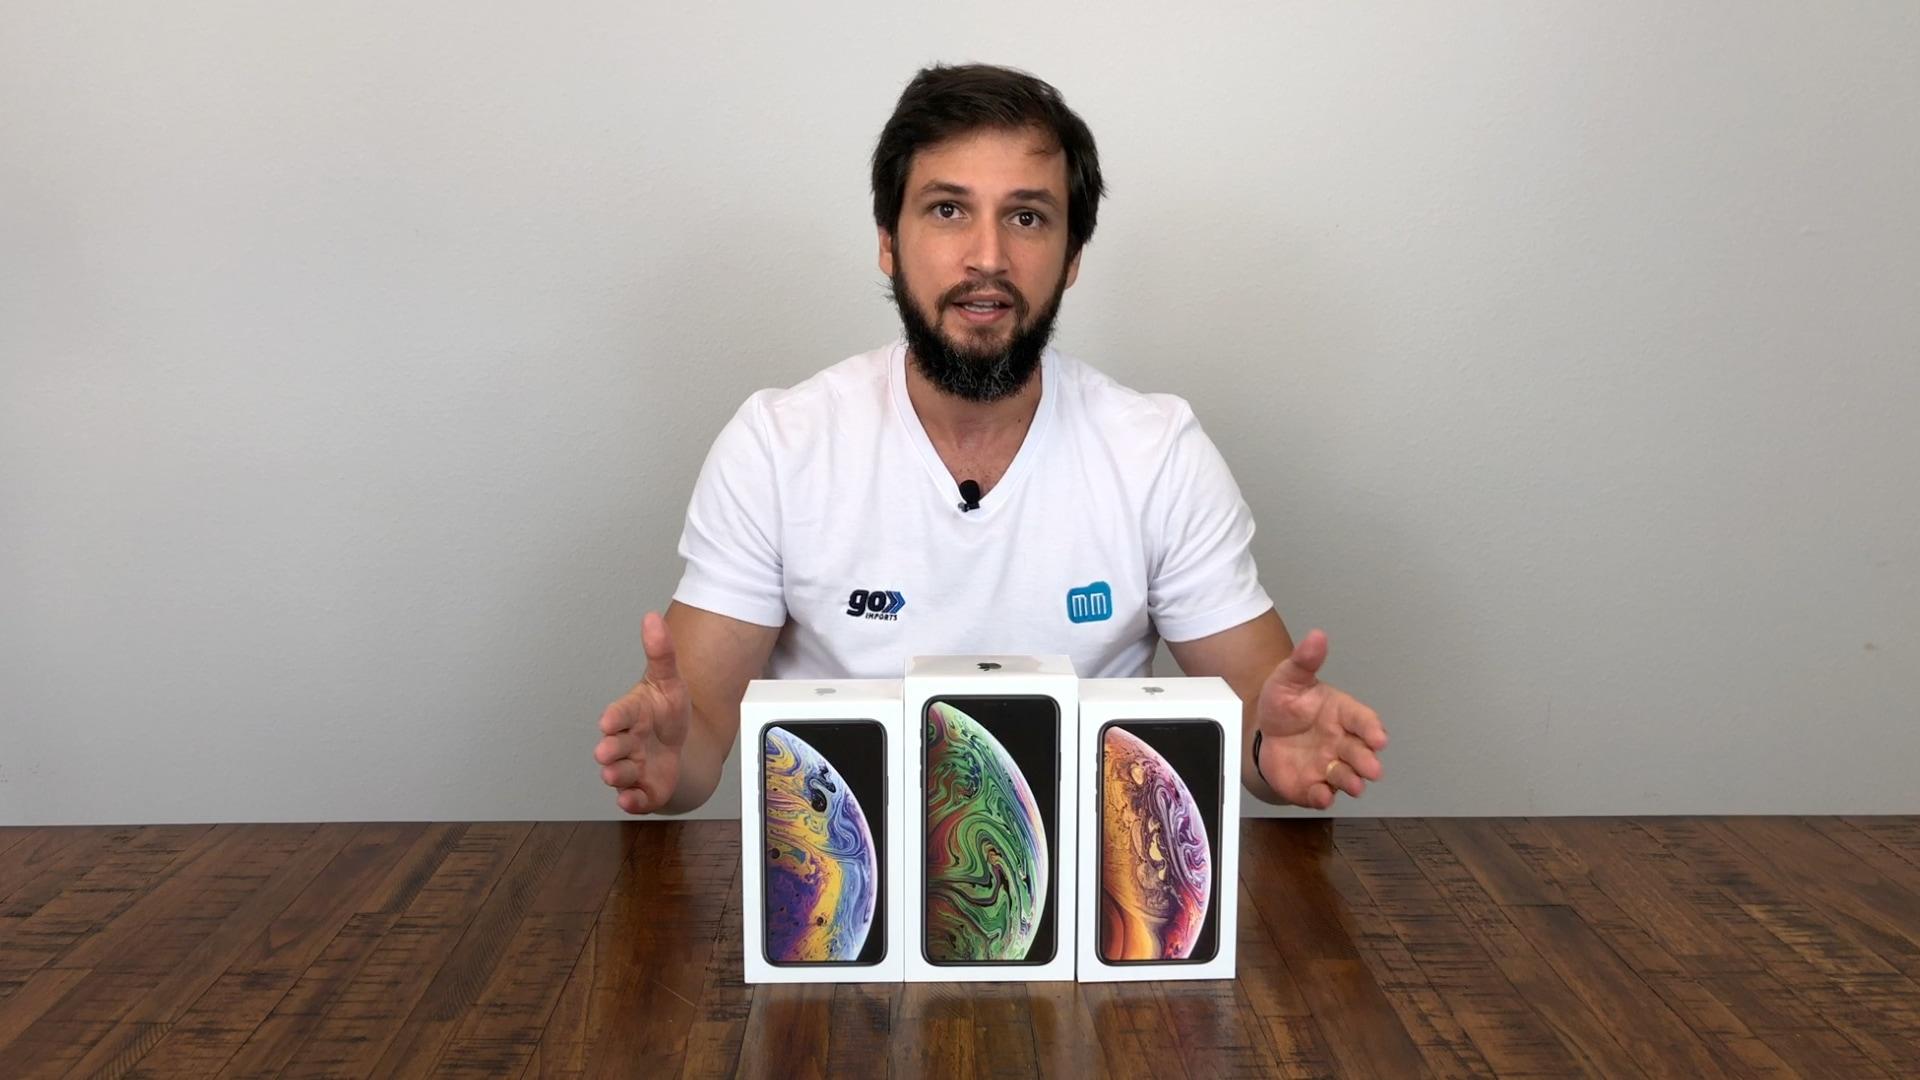 Unboxing dos iPhones XS e XS Max